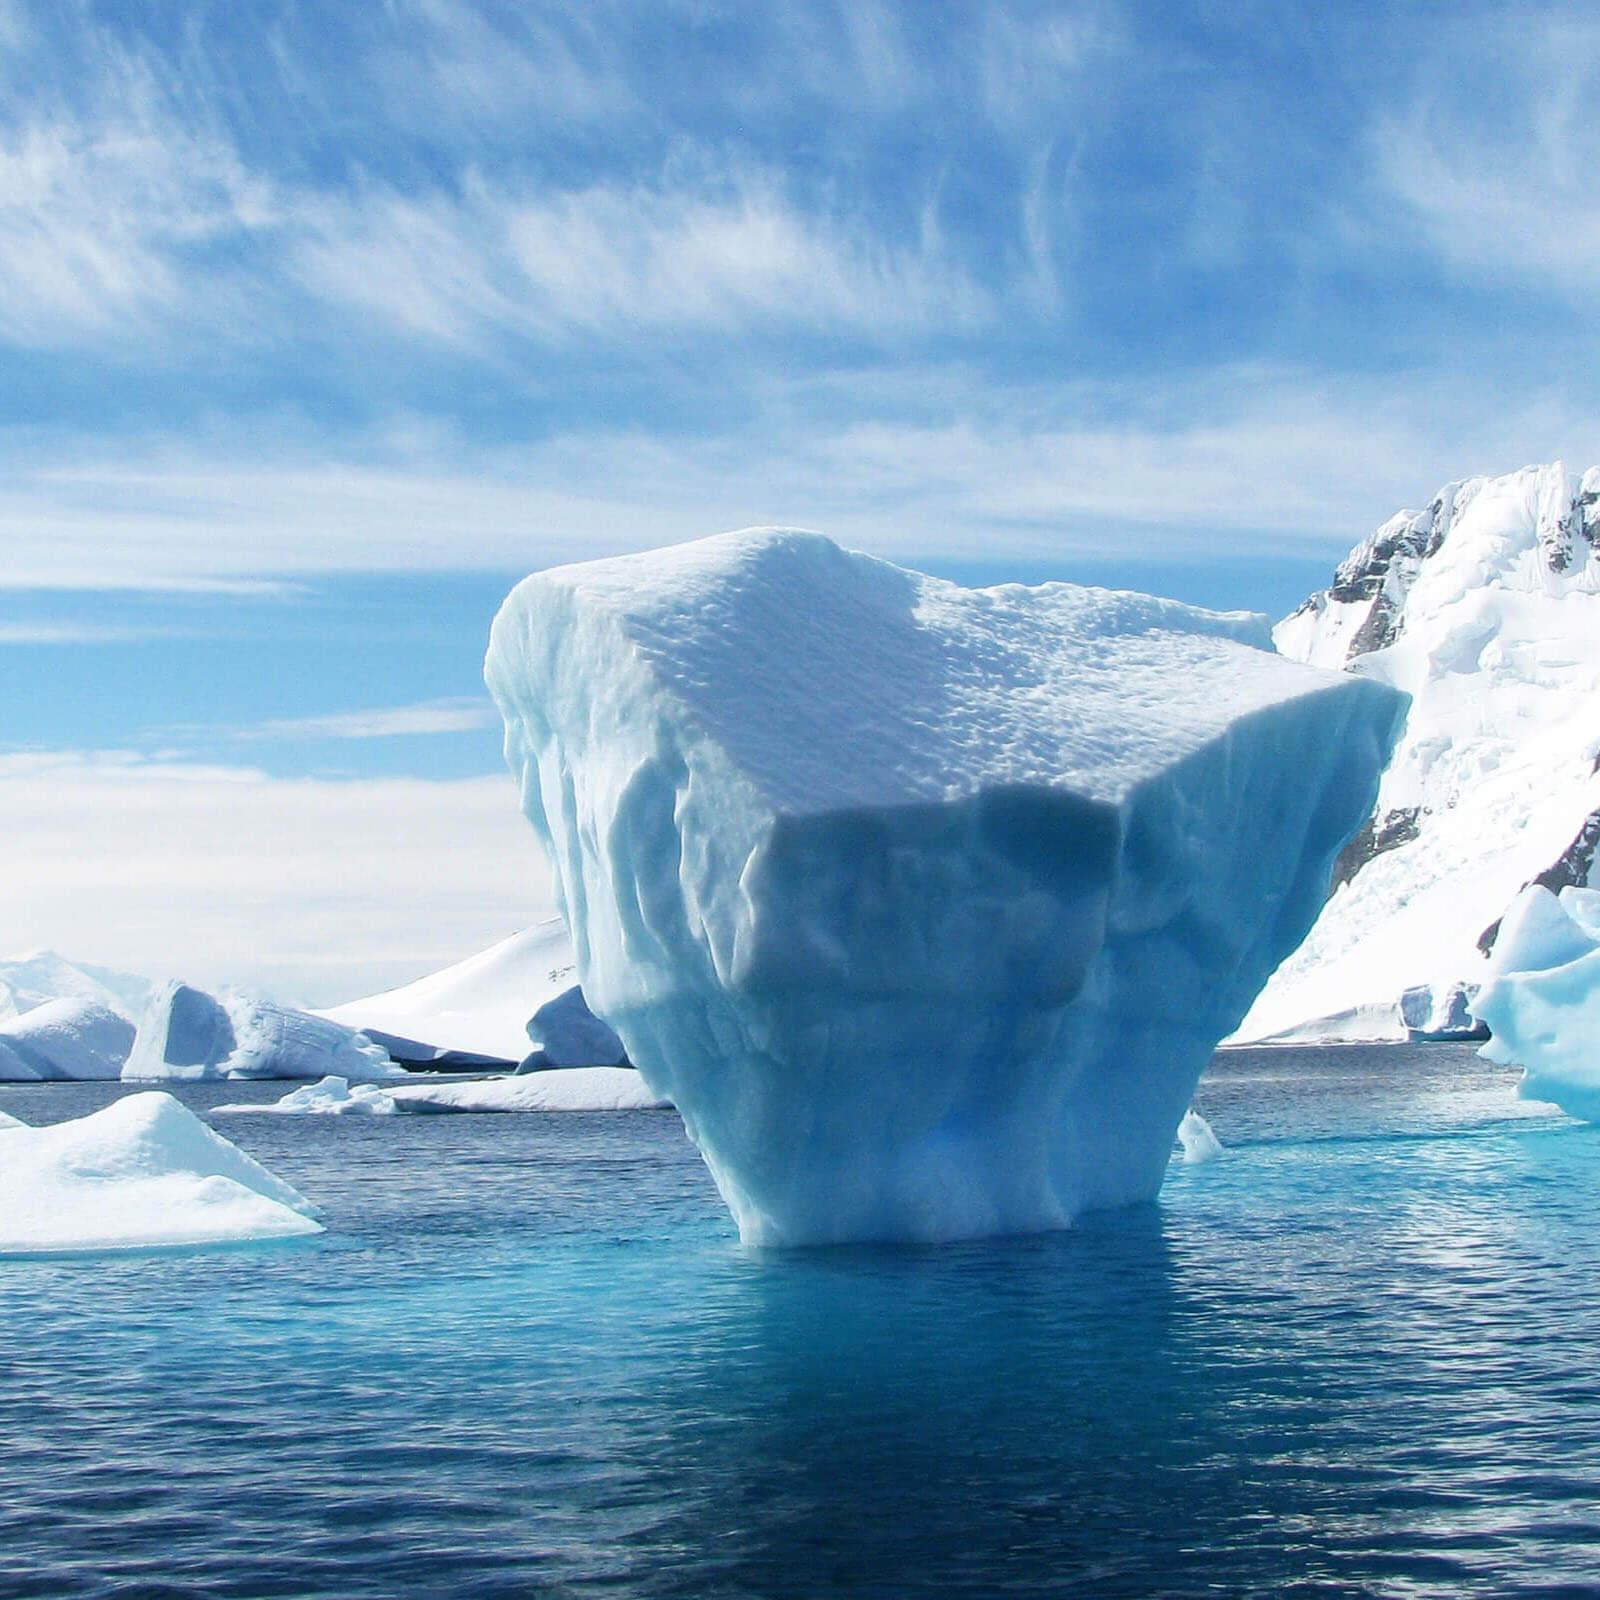 a small iceberg